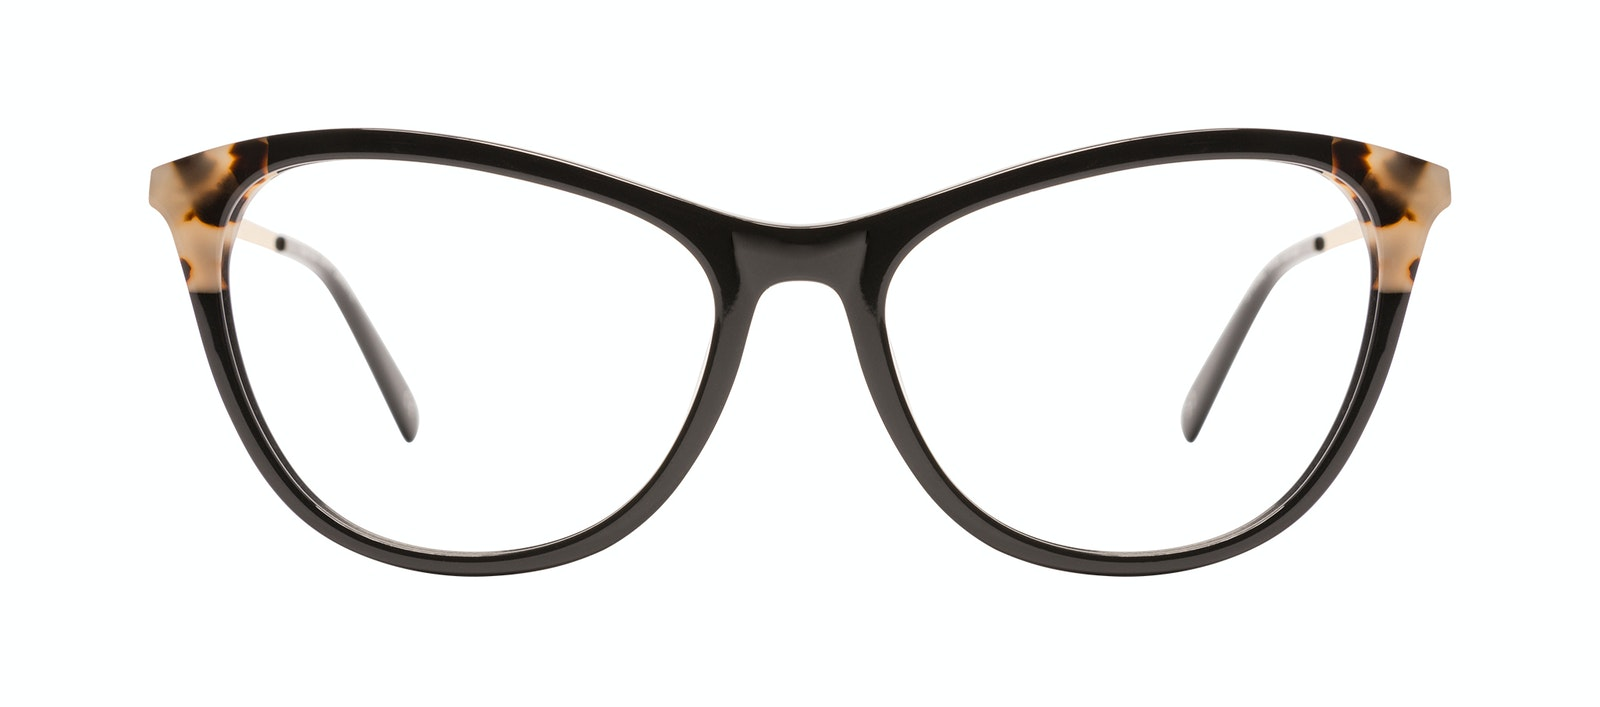 Affordable Fashion Glasses Rectangle Eyeglasses Women Folk Plus Ebony Granite Front